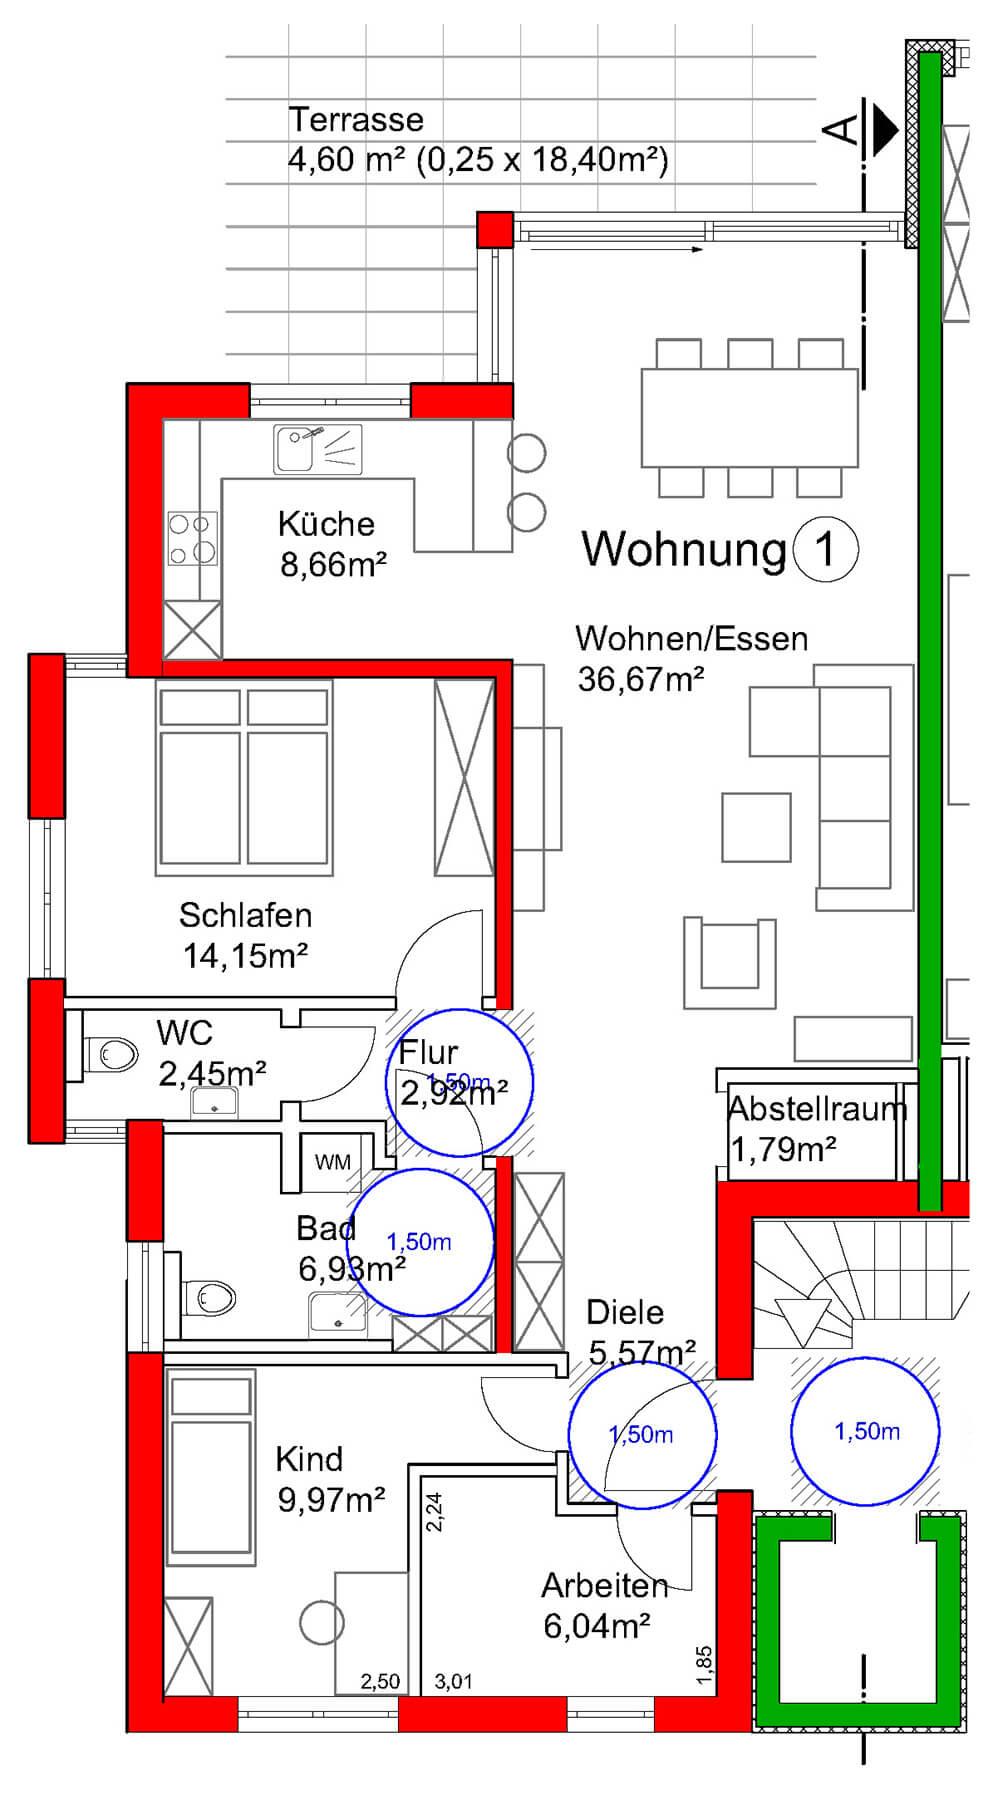 Grundriss Wohnung 1 - Neubau Hermann-Löns-Weg 1